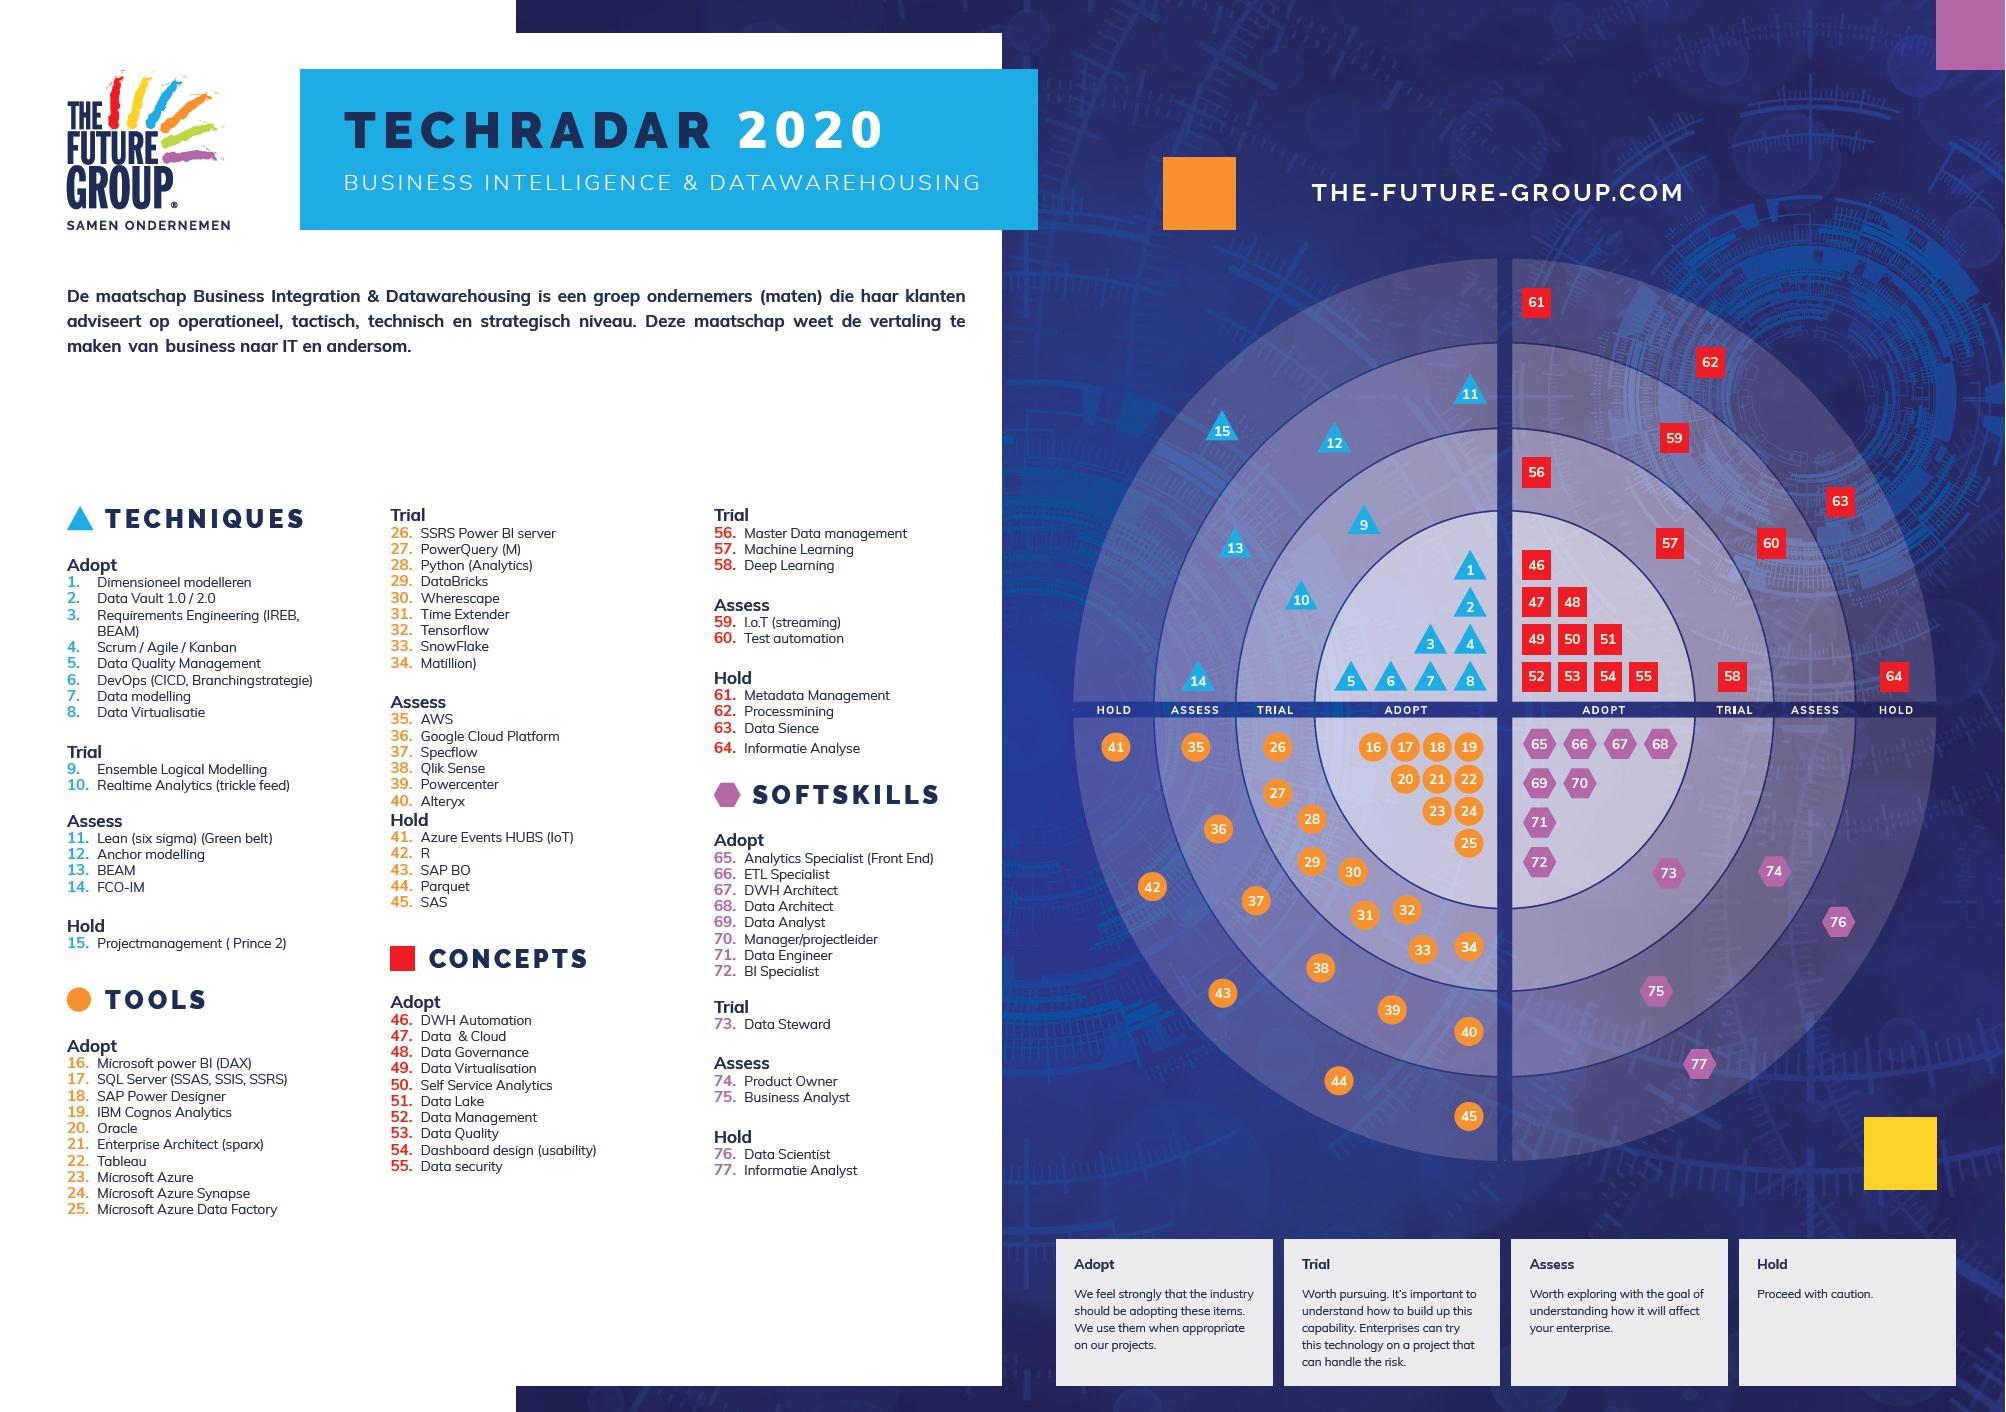 Tech Radar Business Intelligence & Datawarehousing